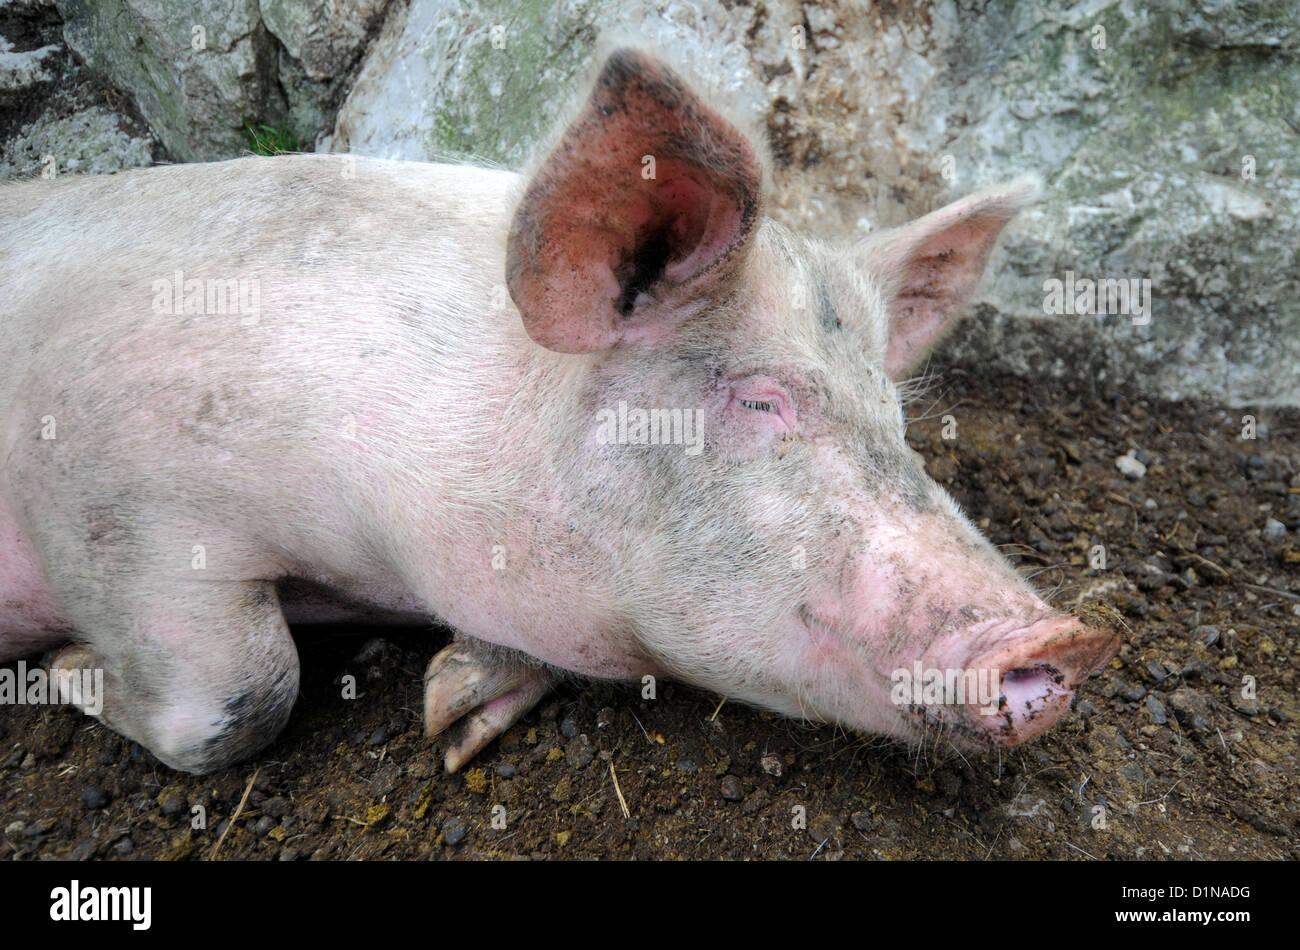 Pig, sleeping pig, pig asleep - Stock Image